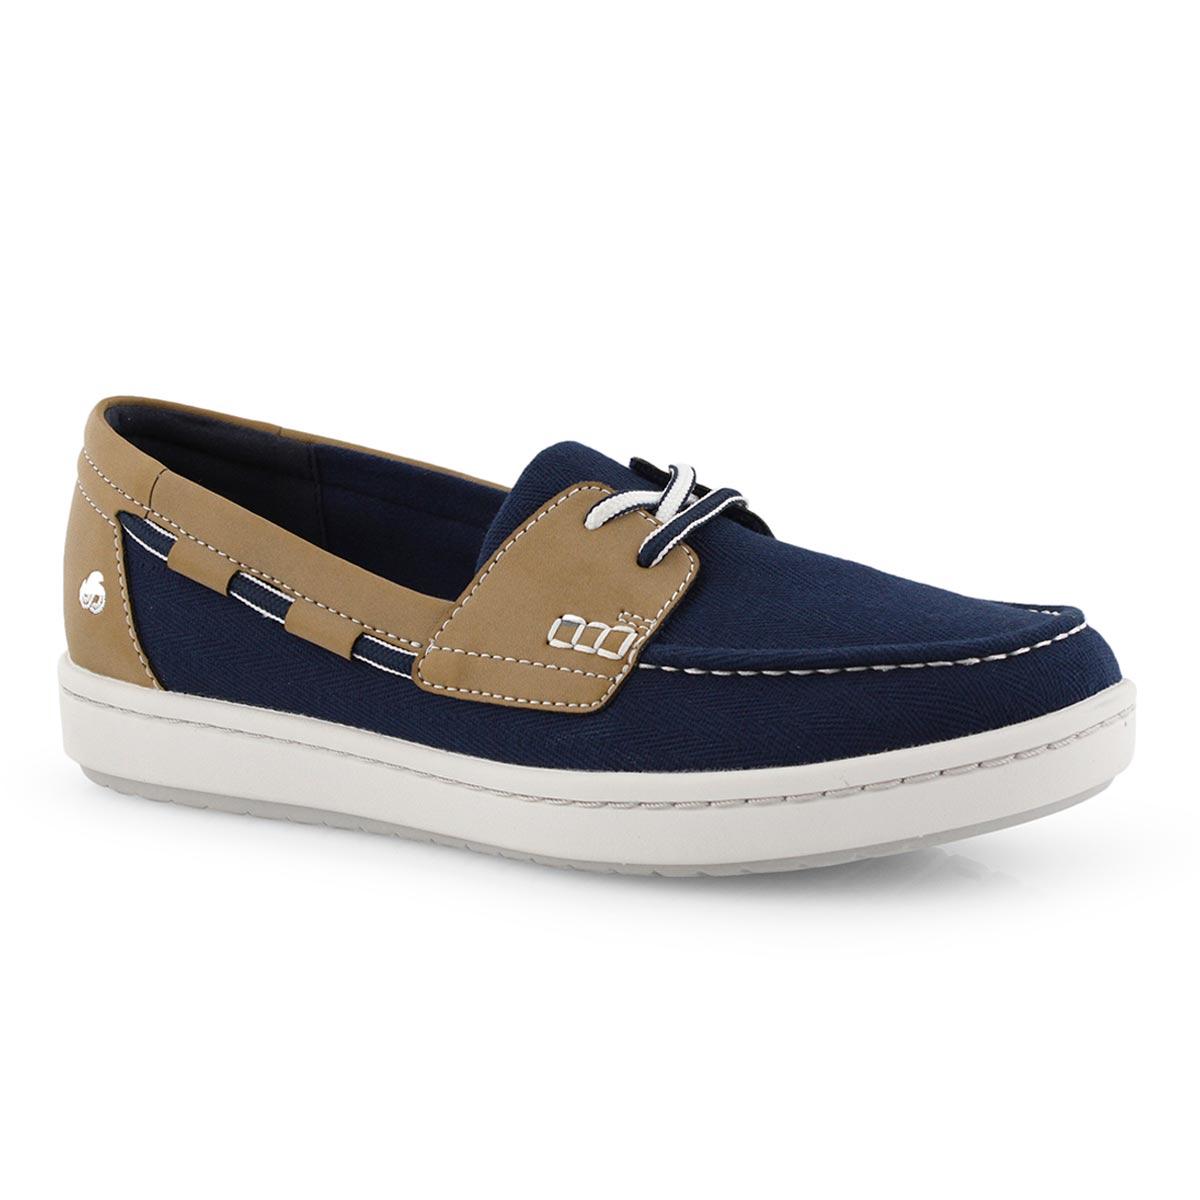 Lds Step Glow Lite navy slip on shoe